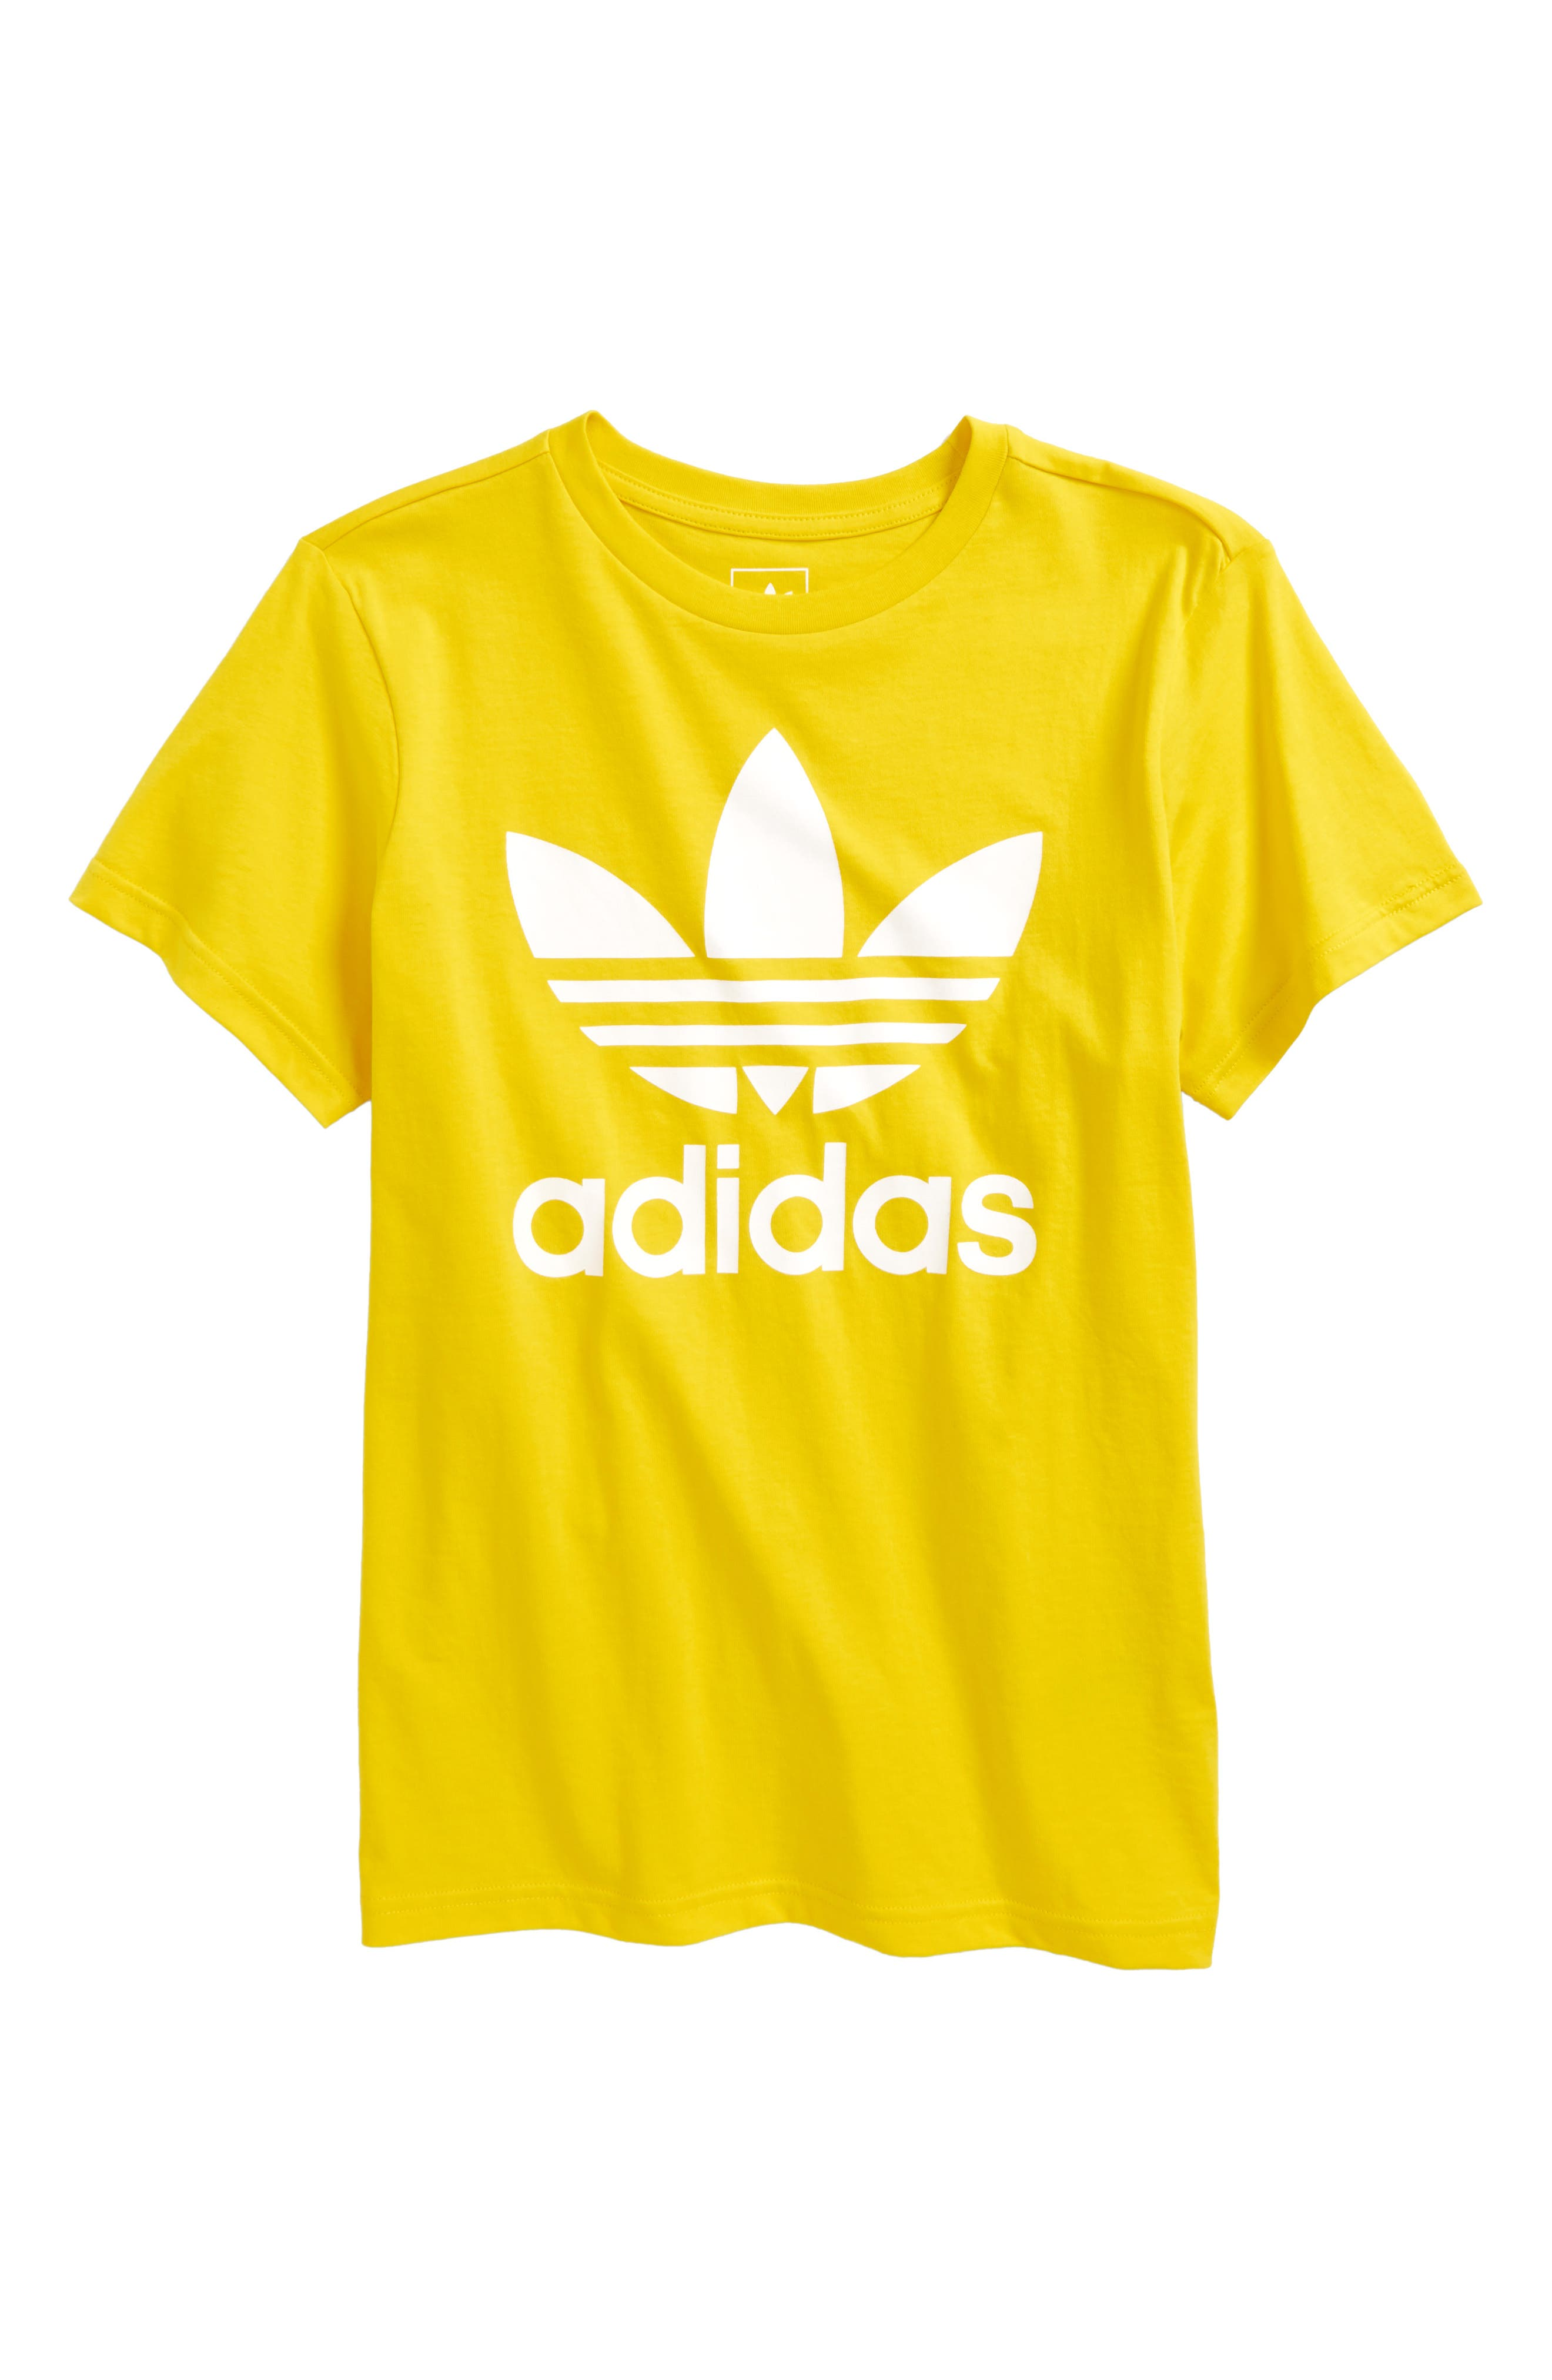 adidas Trefoil Logo Graphic Tee (Big Girls)